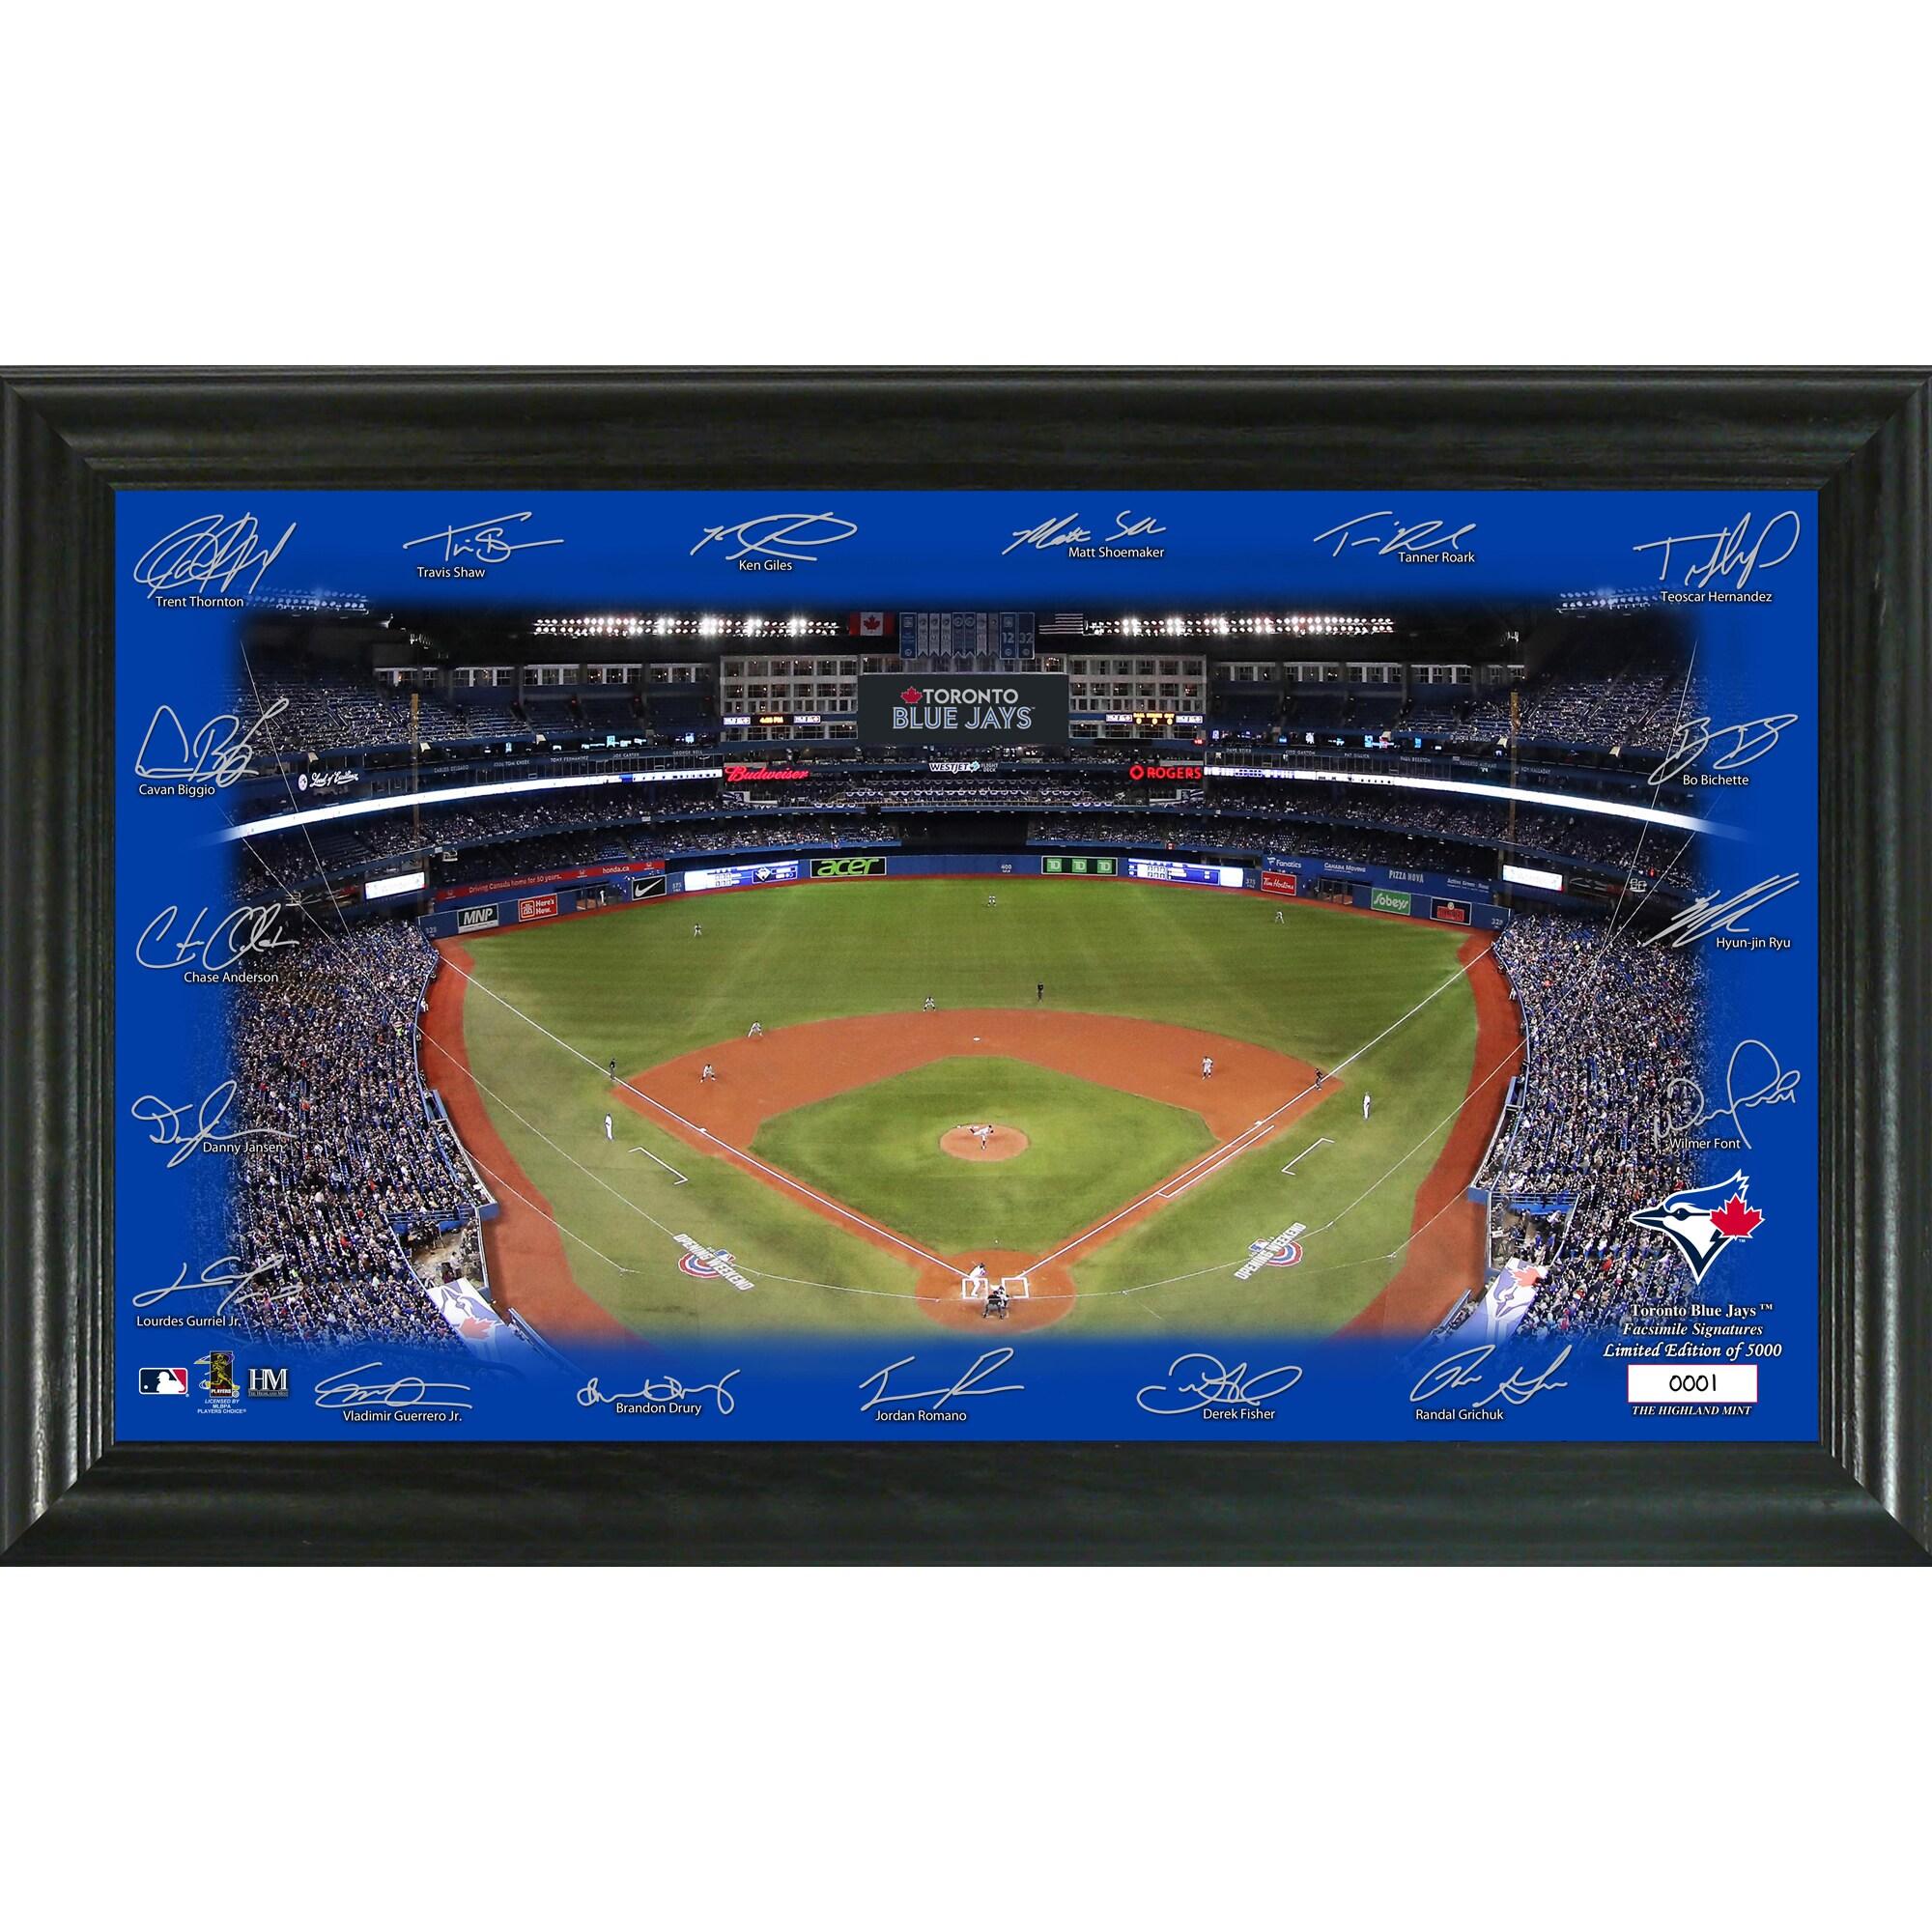 Toronto Blue Jays Highland Mint 12'' x 20'' Signature Field Limited Editon Framed Photo Mint